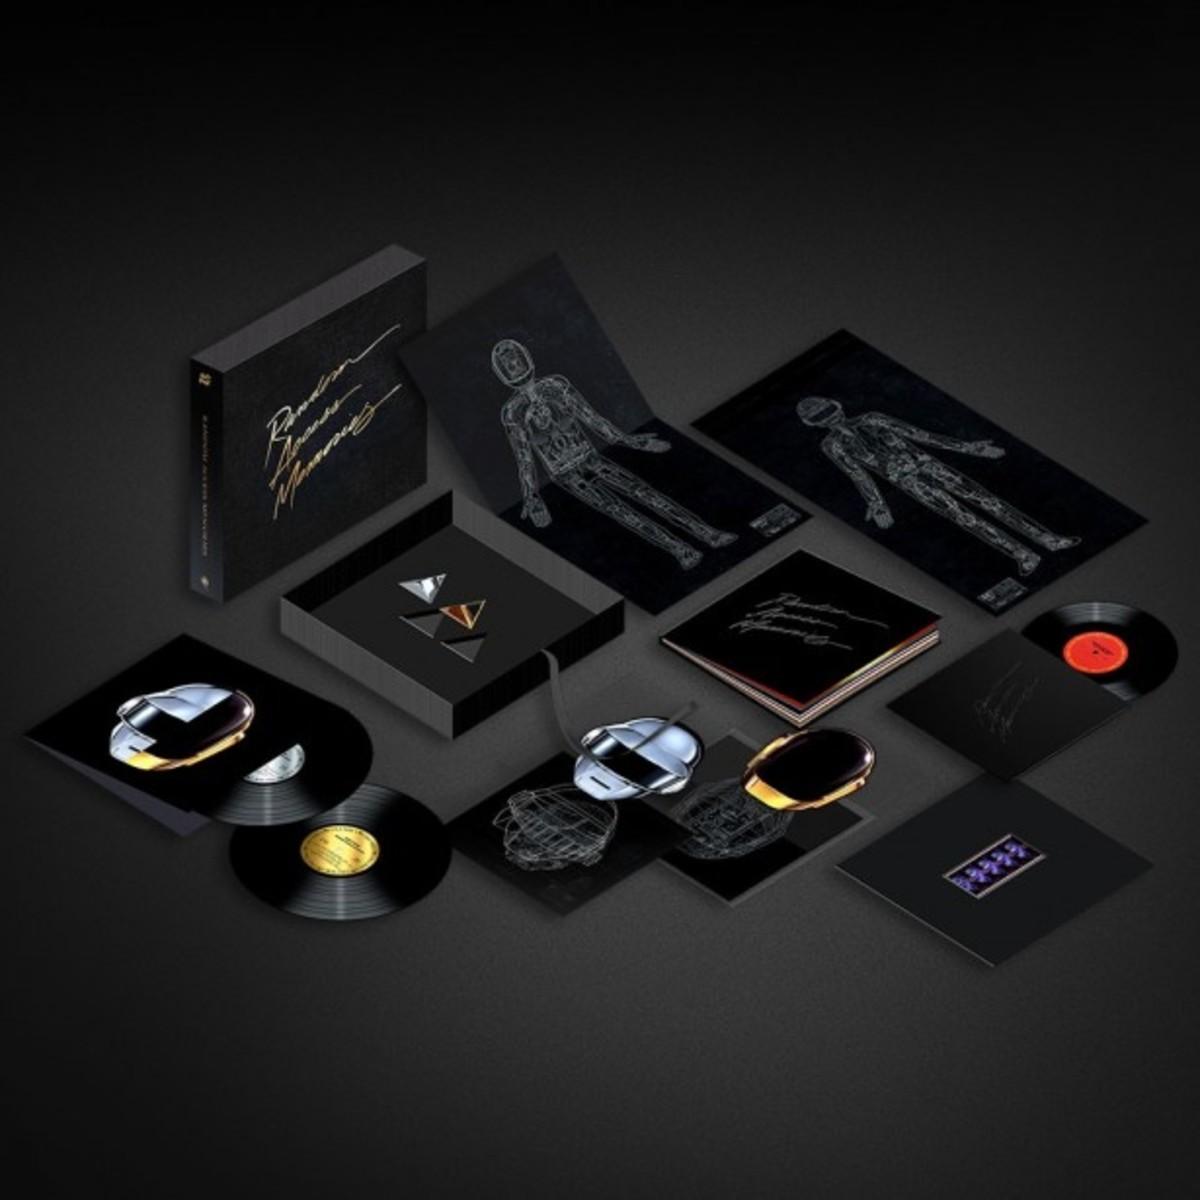 EDM News: Daft Punk Announces $250 Random Access Memories Limited Edition Box Set